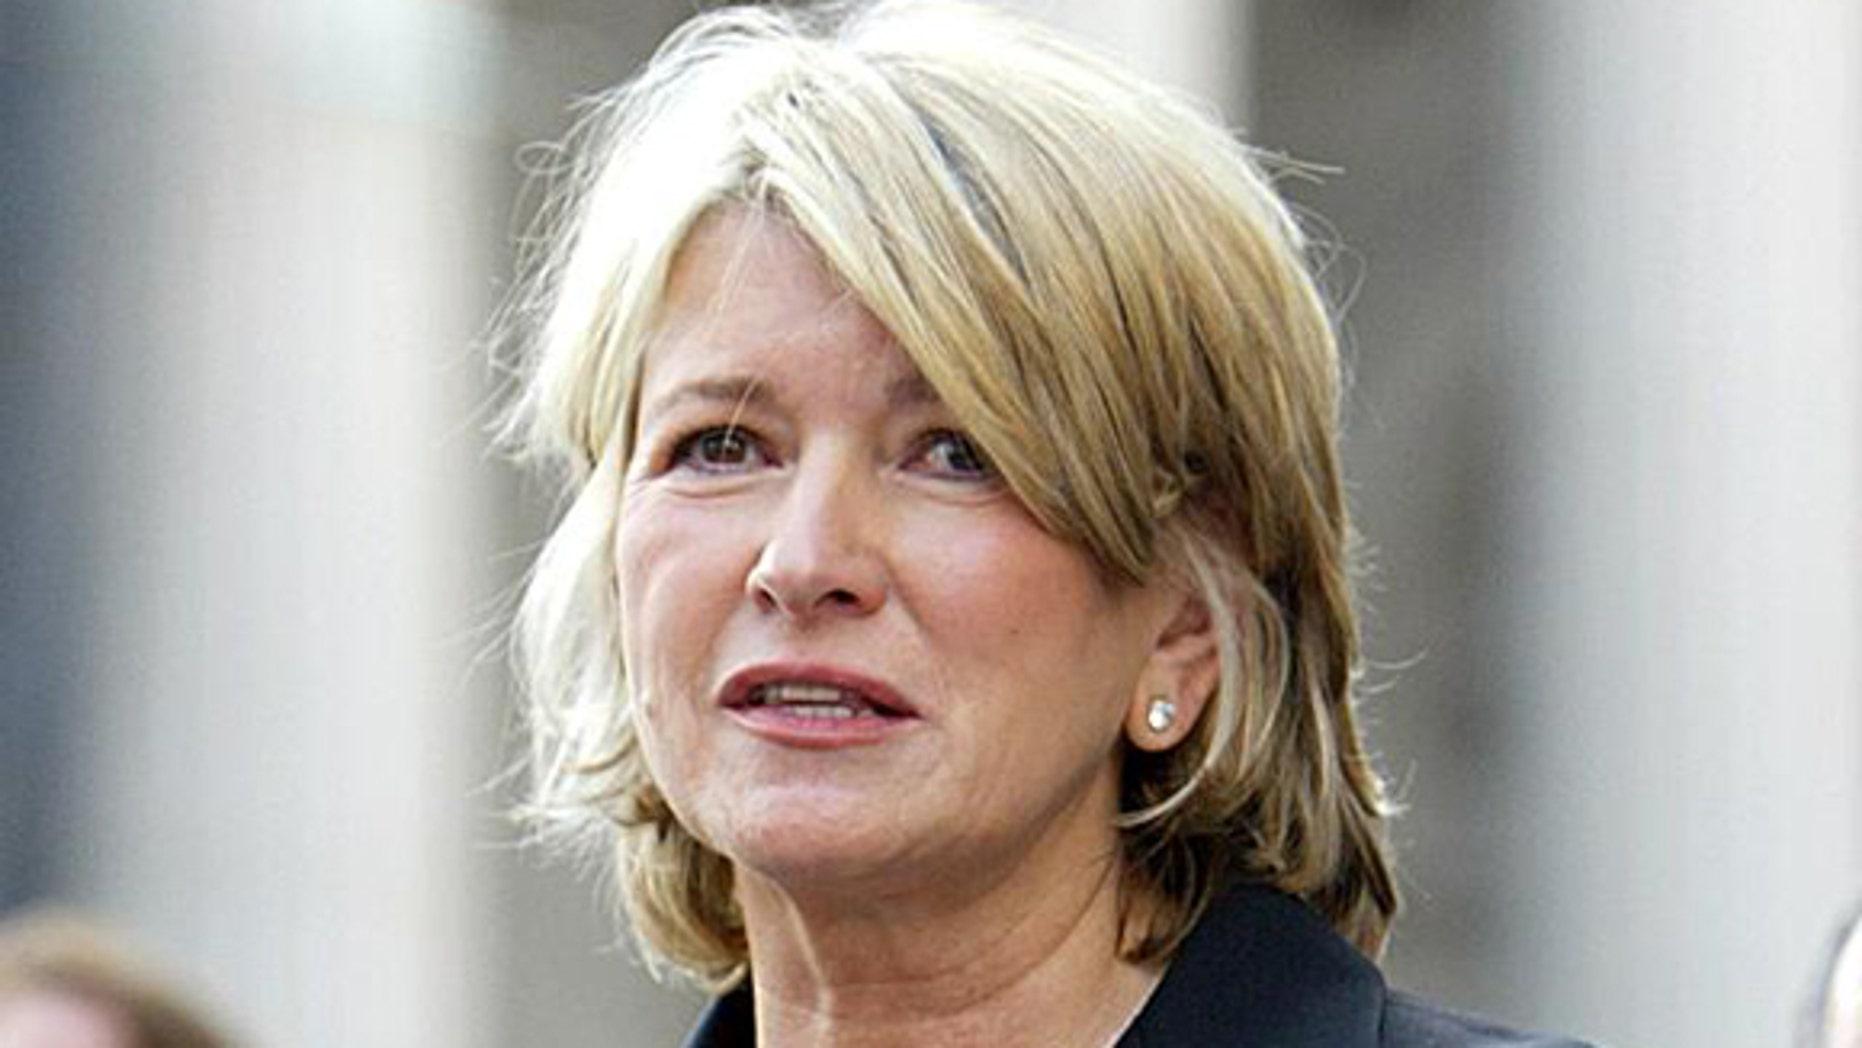 Martha Stewart reads a statement after sentencing at Manhattan federal court, Friday July 16, 2004, in New York.